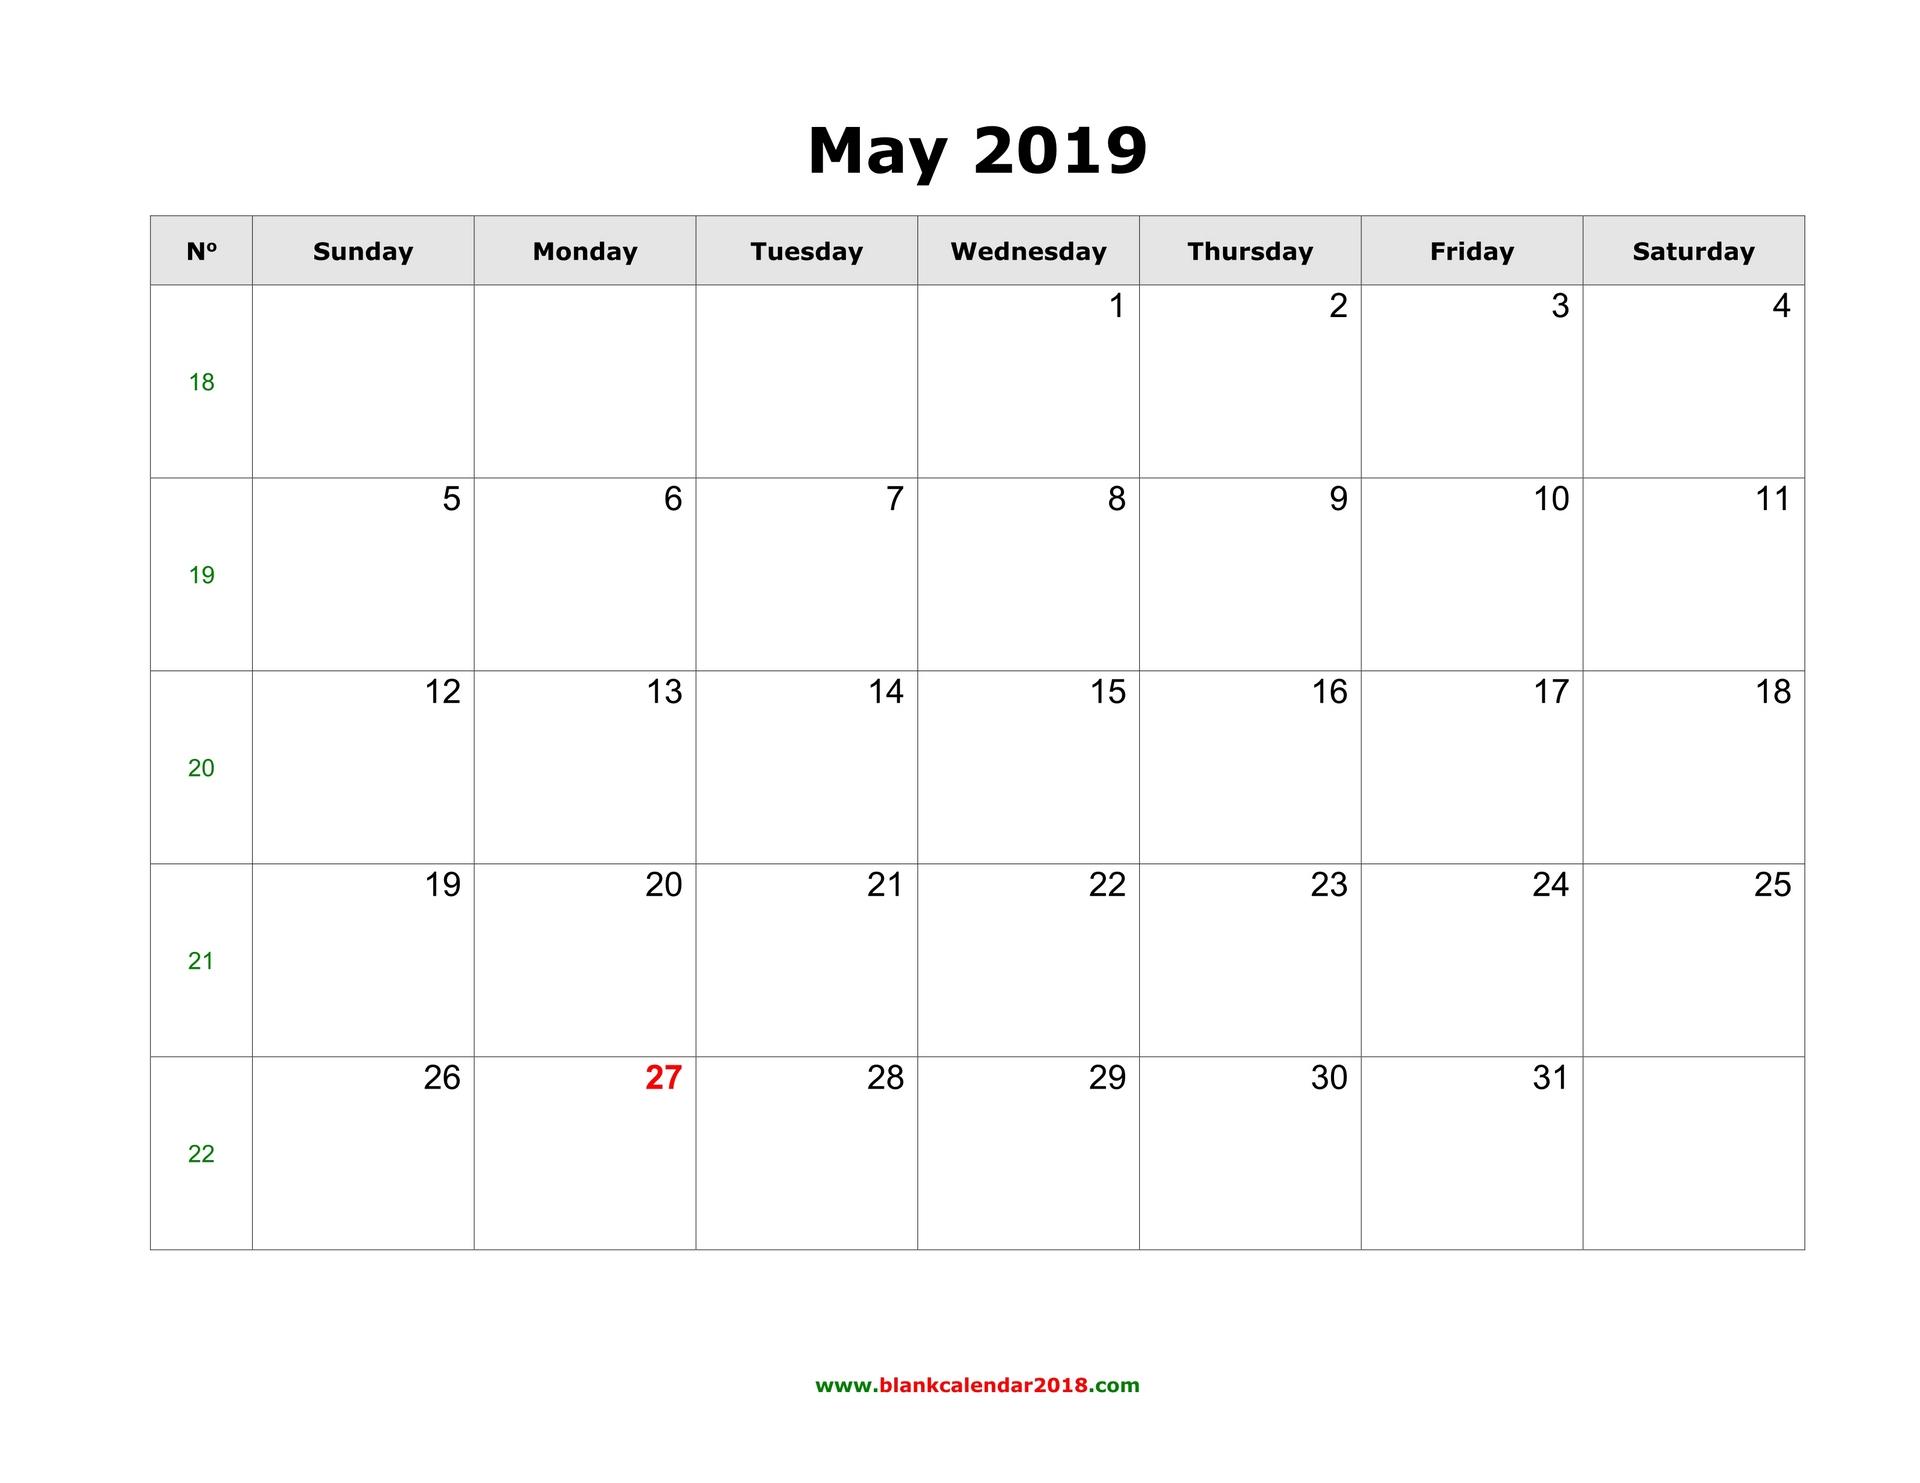 Blank Calendar For May 2019